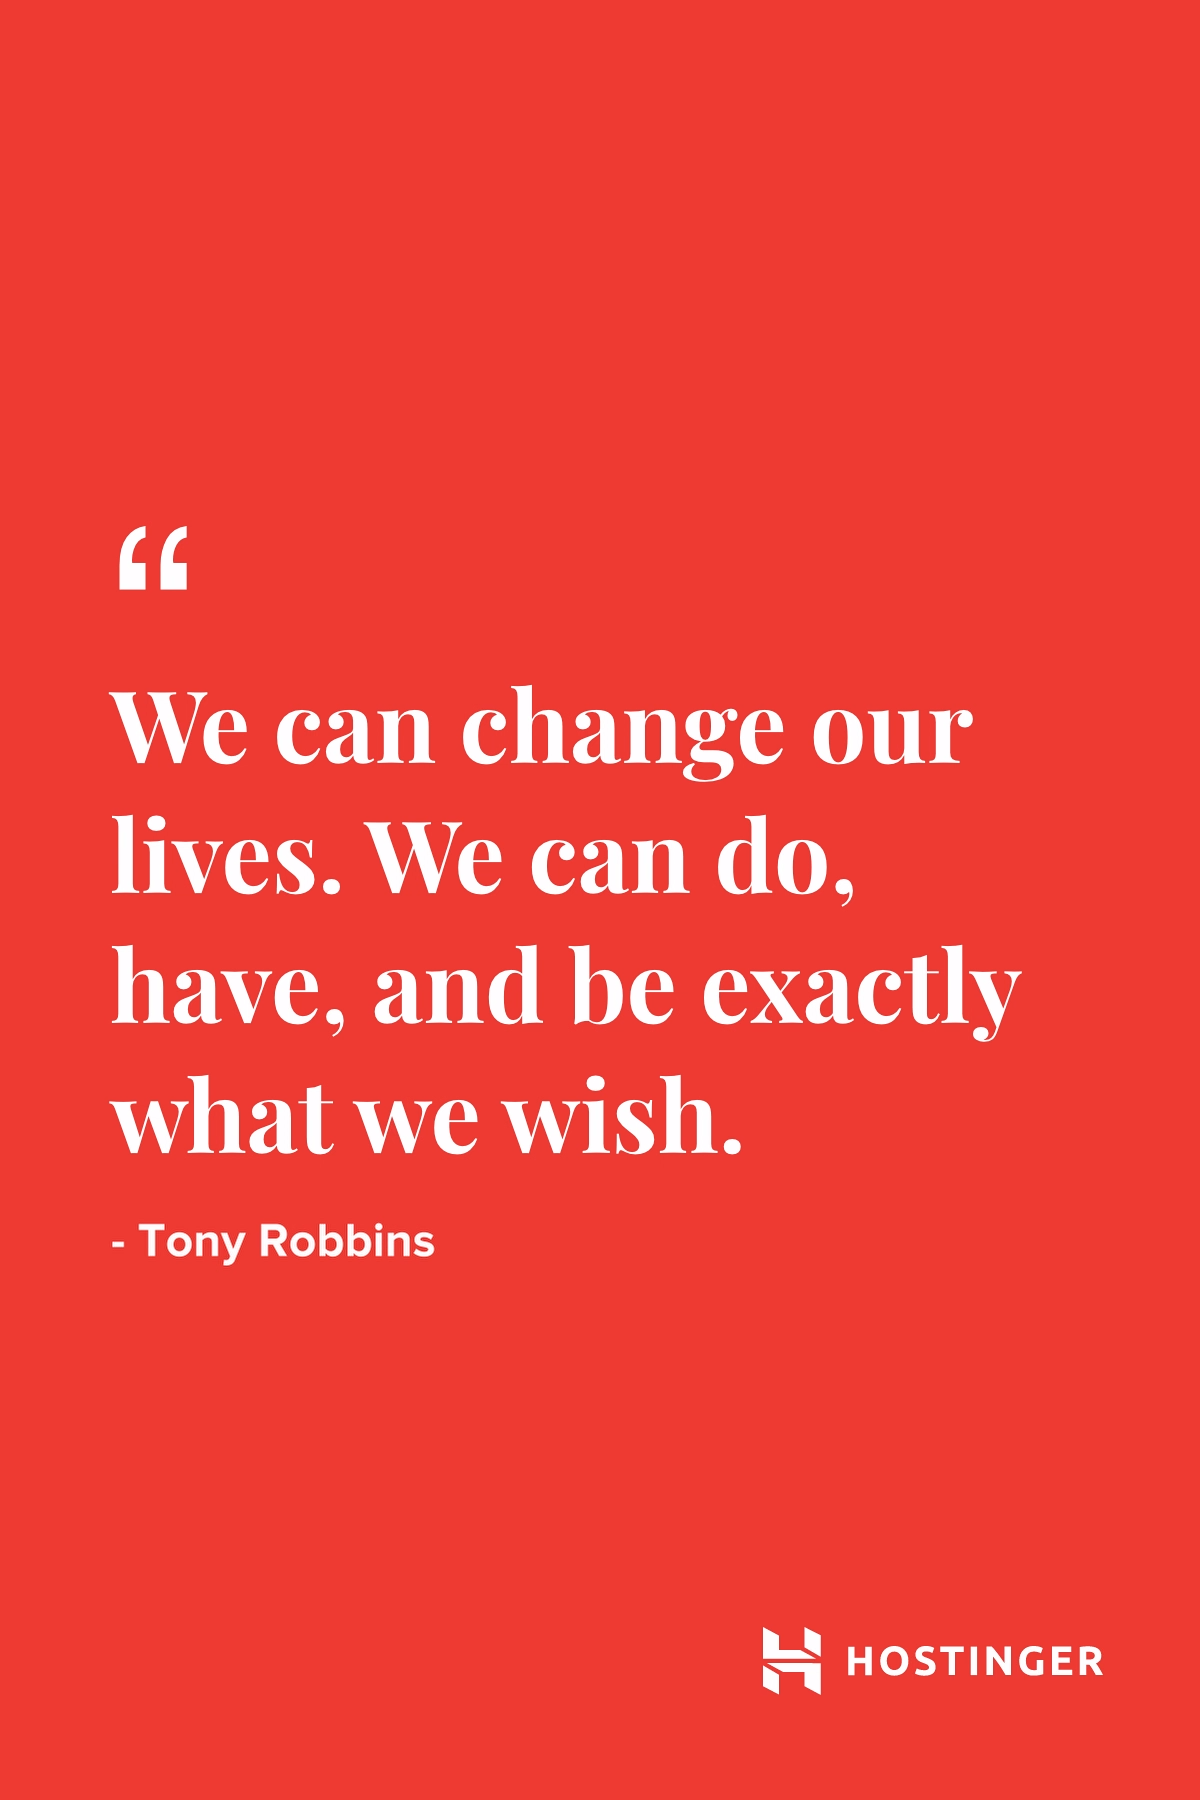 Quotes | Hostinger | Inspirational | Tony Robbins